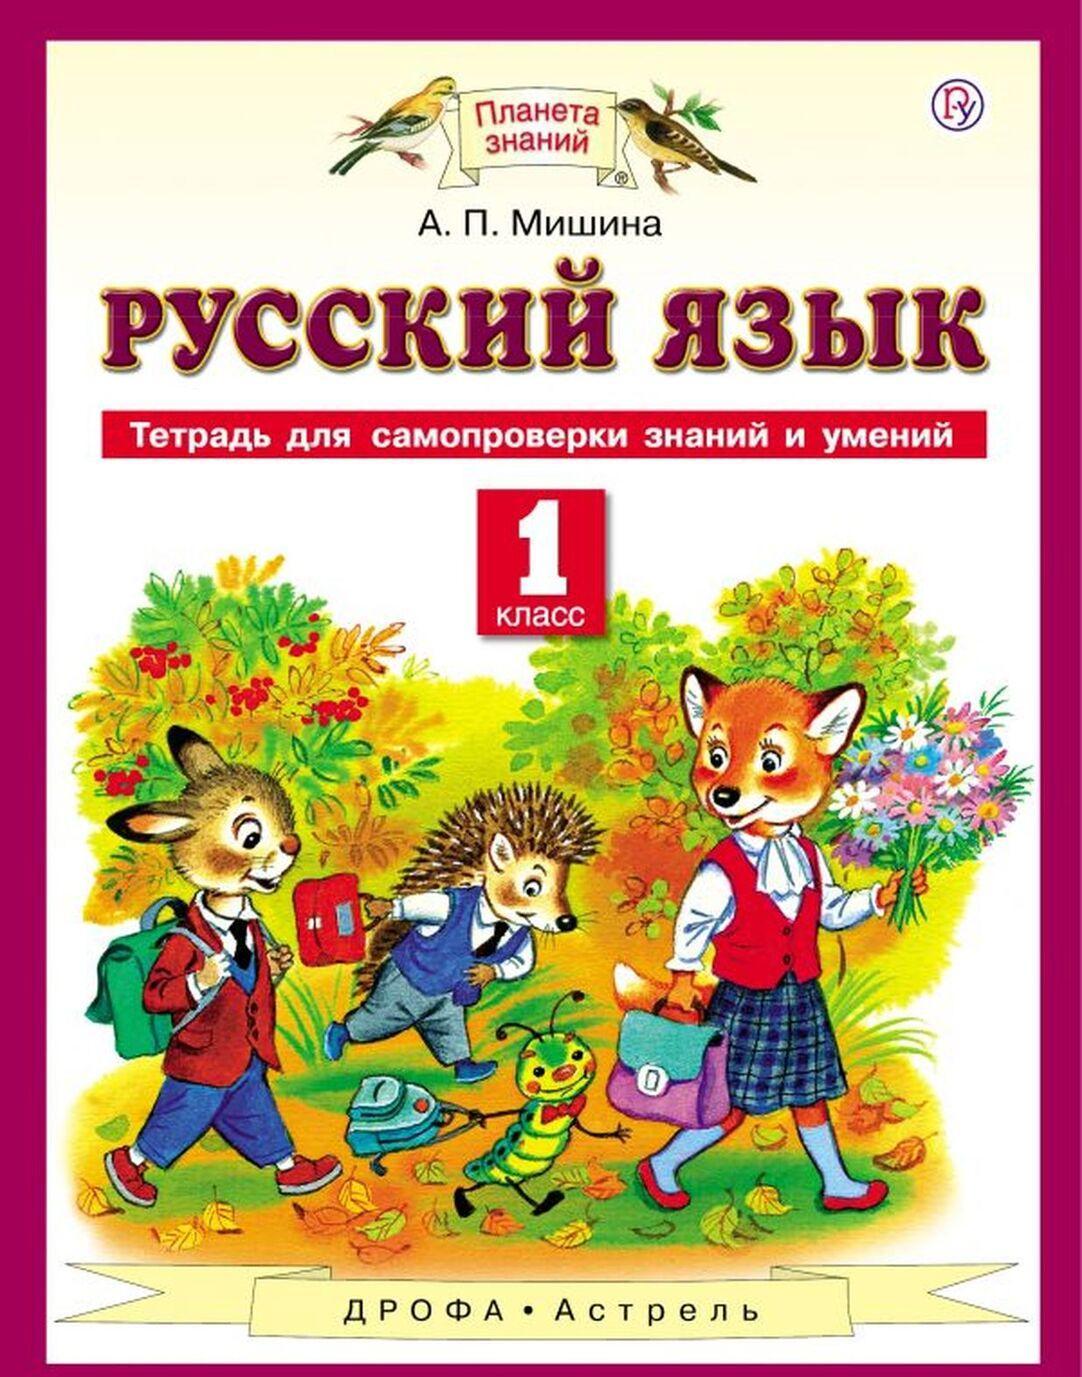 Russkij jazyk. 1 klass. Tetrad dlja samoproverki znanij i umenij